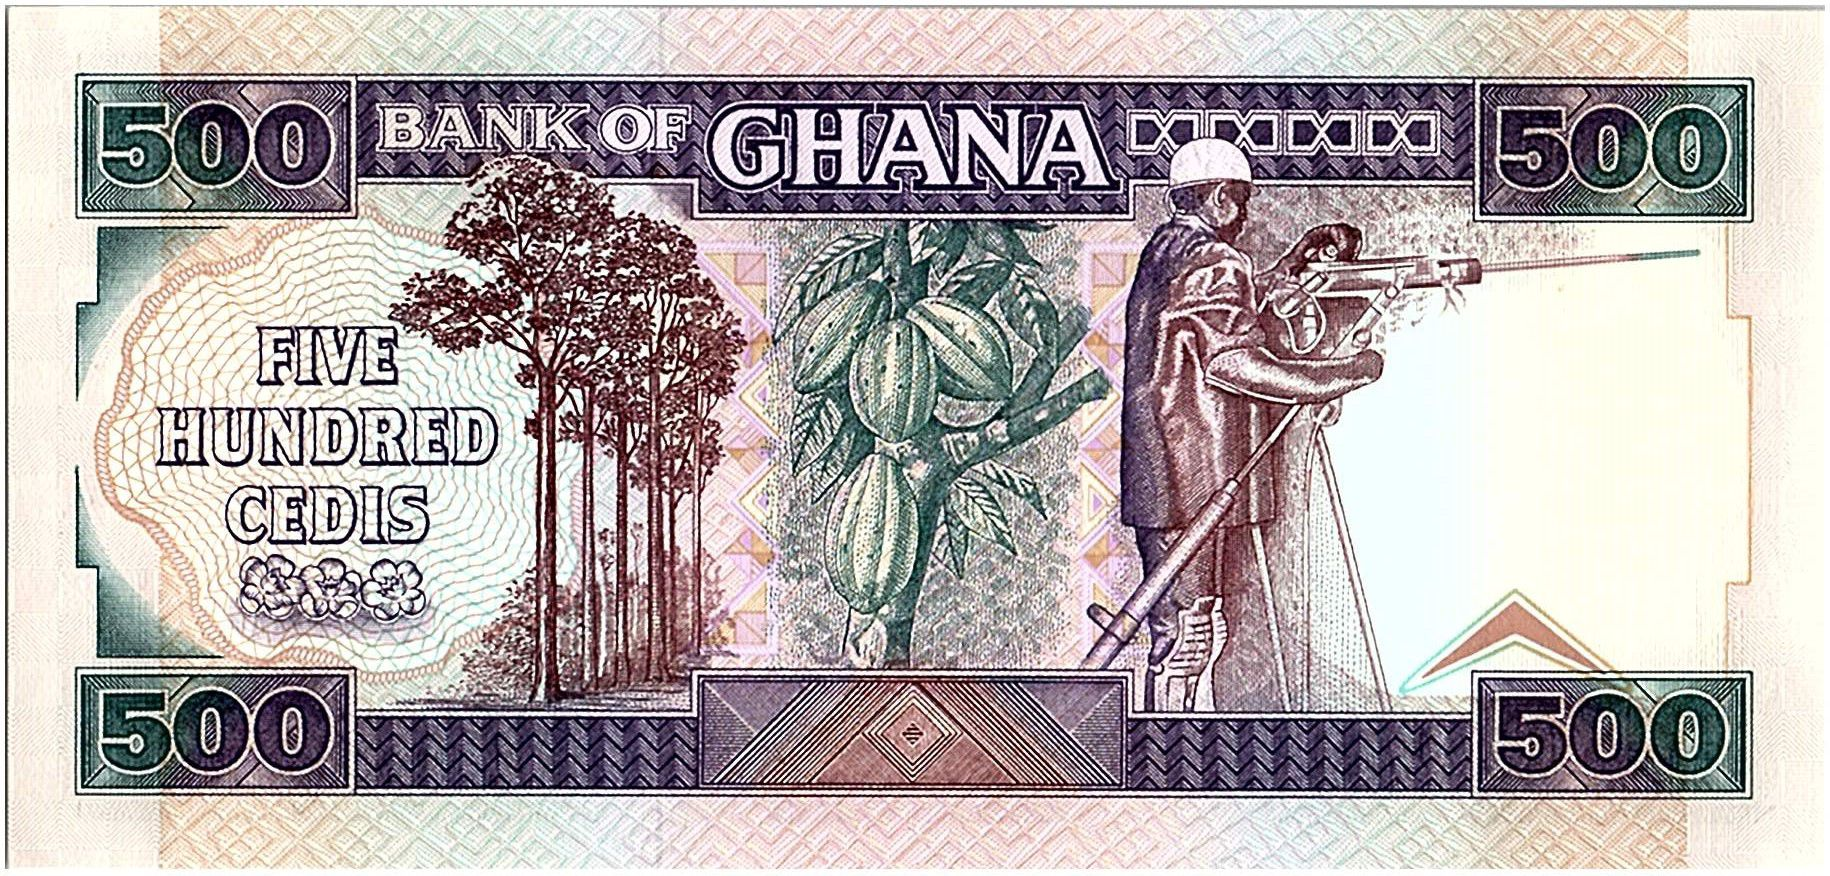 Ghana 500 Cedis - Travail et Industrie - 1991